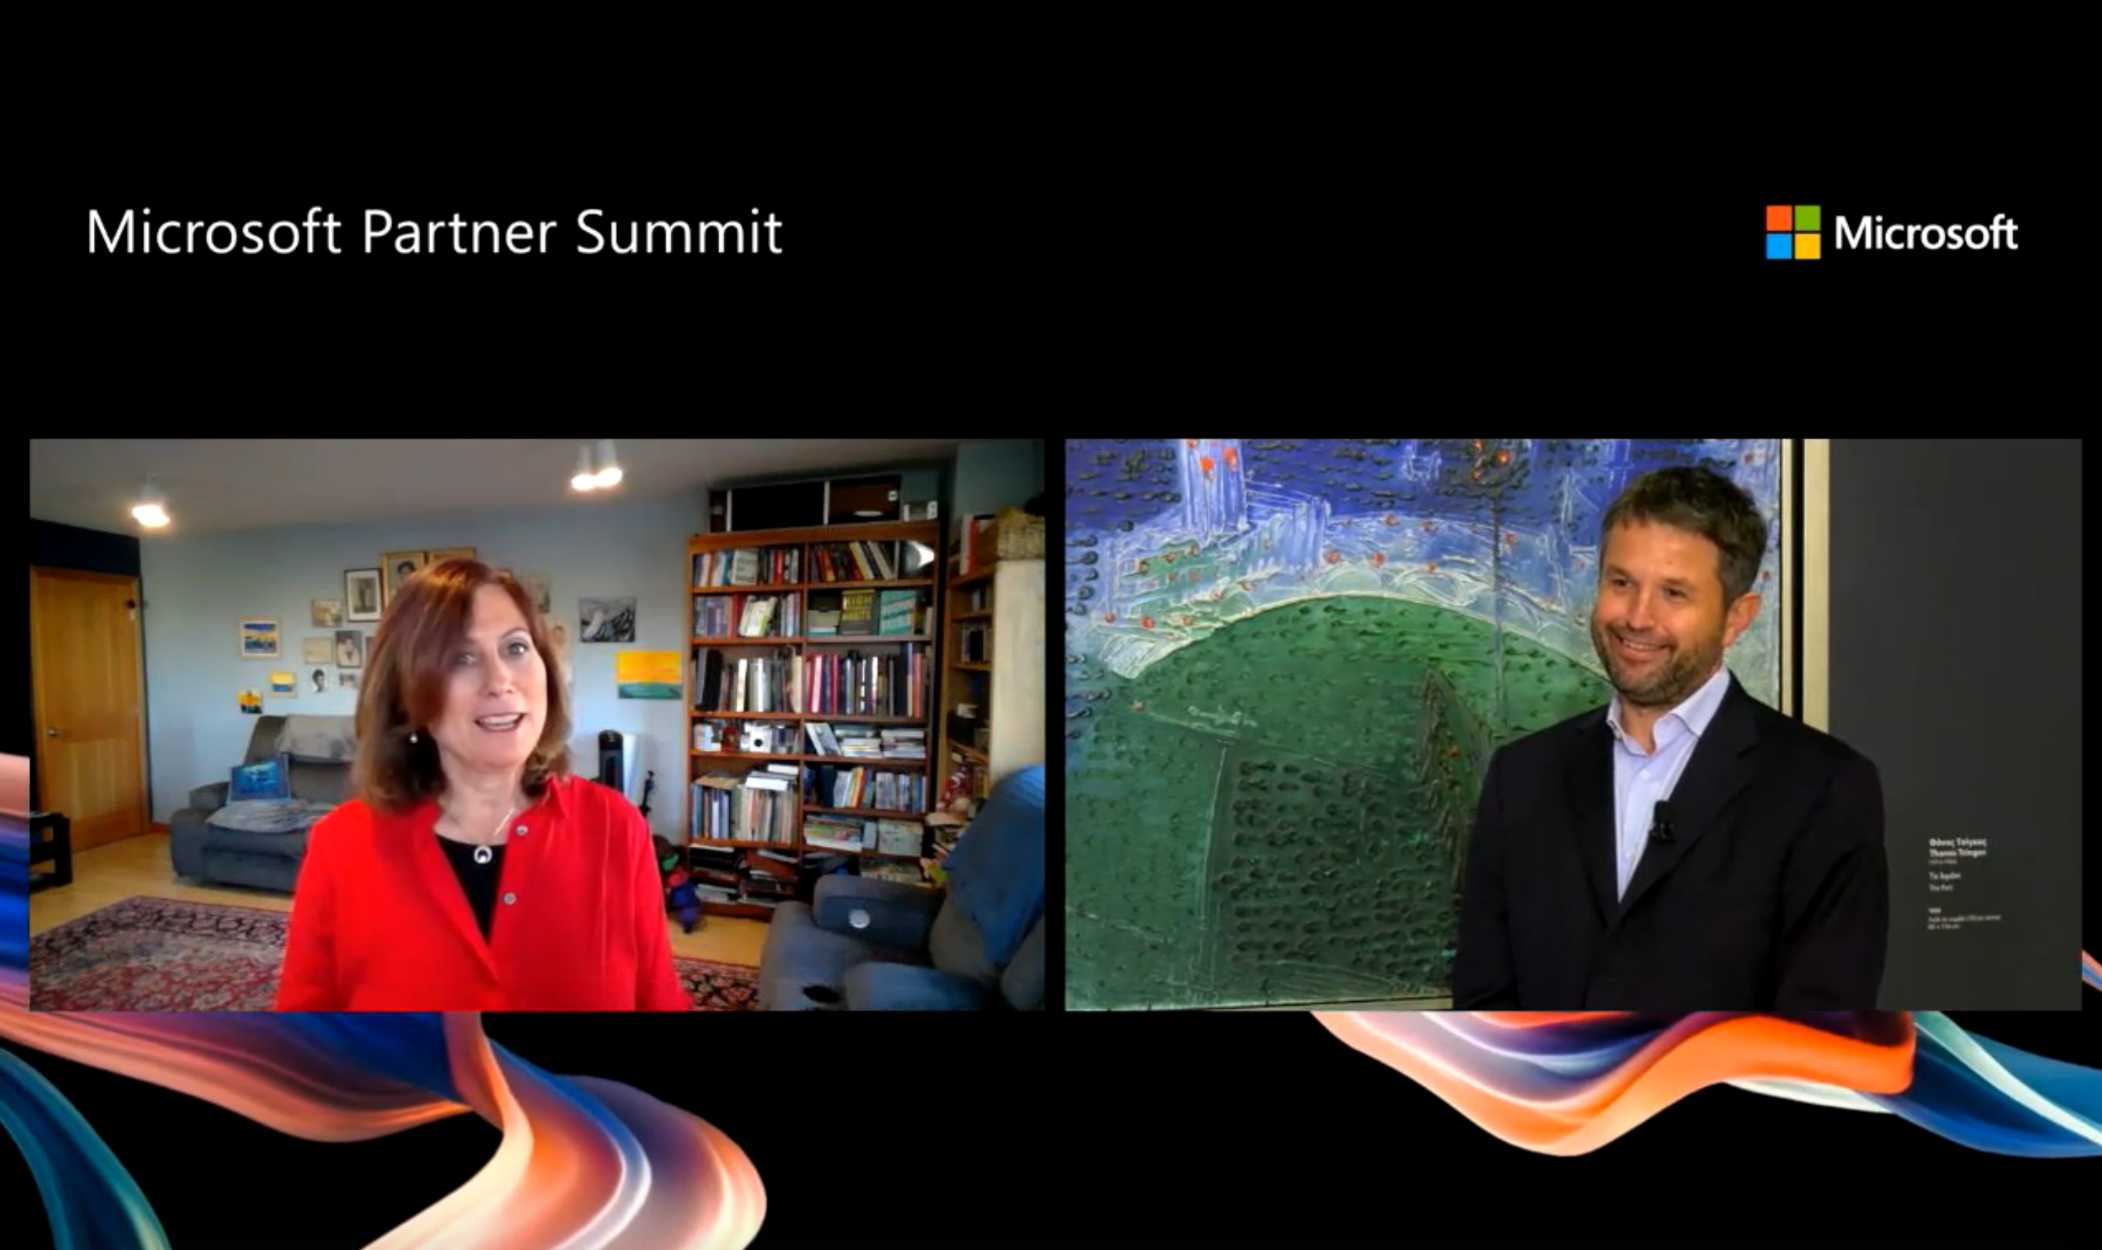 Microsoft Partner Summit : #AccelerateTogether – Δημιουργώντας ένα οικοσύστημα καινοτομίας και γνώσης, μαζί